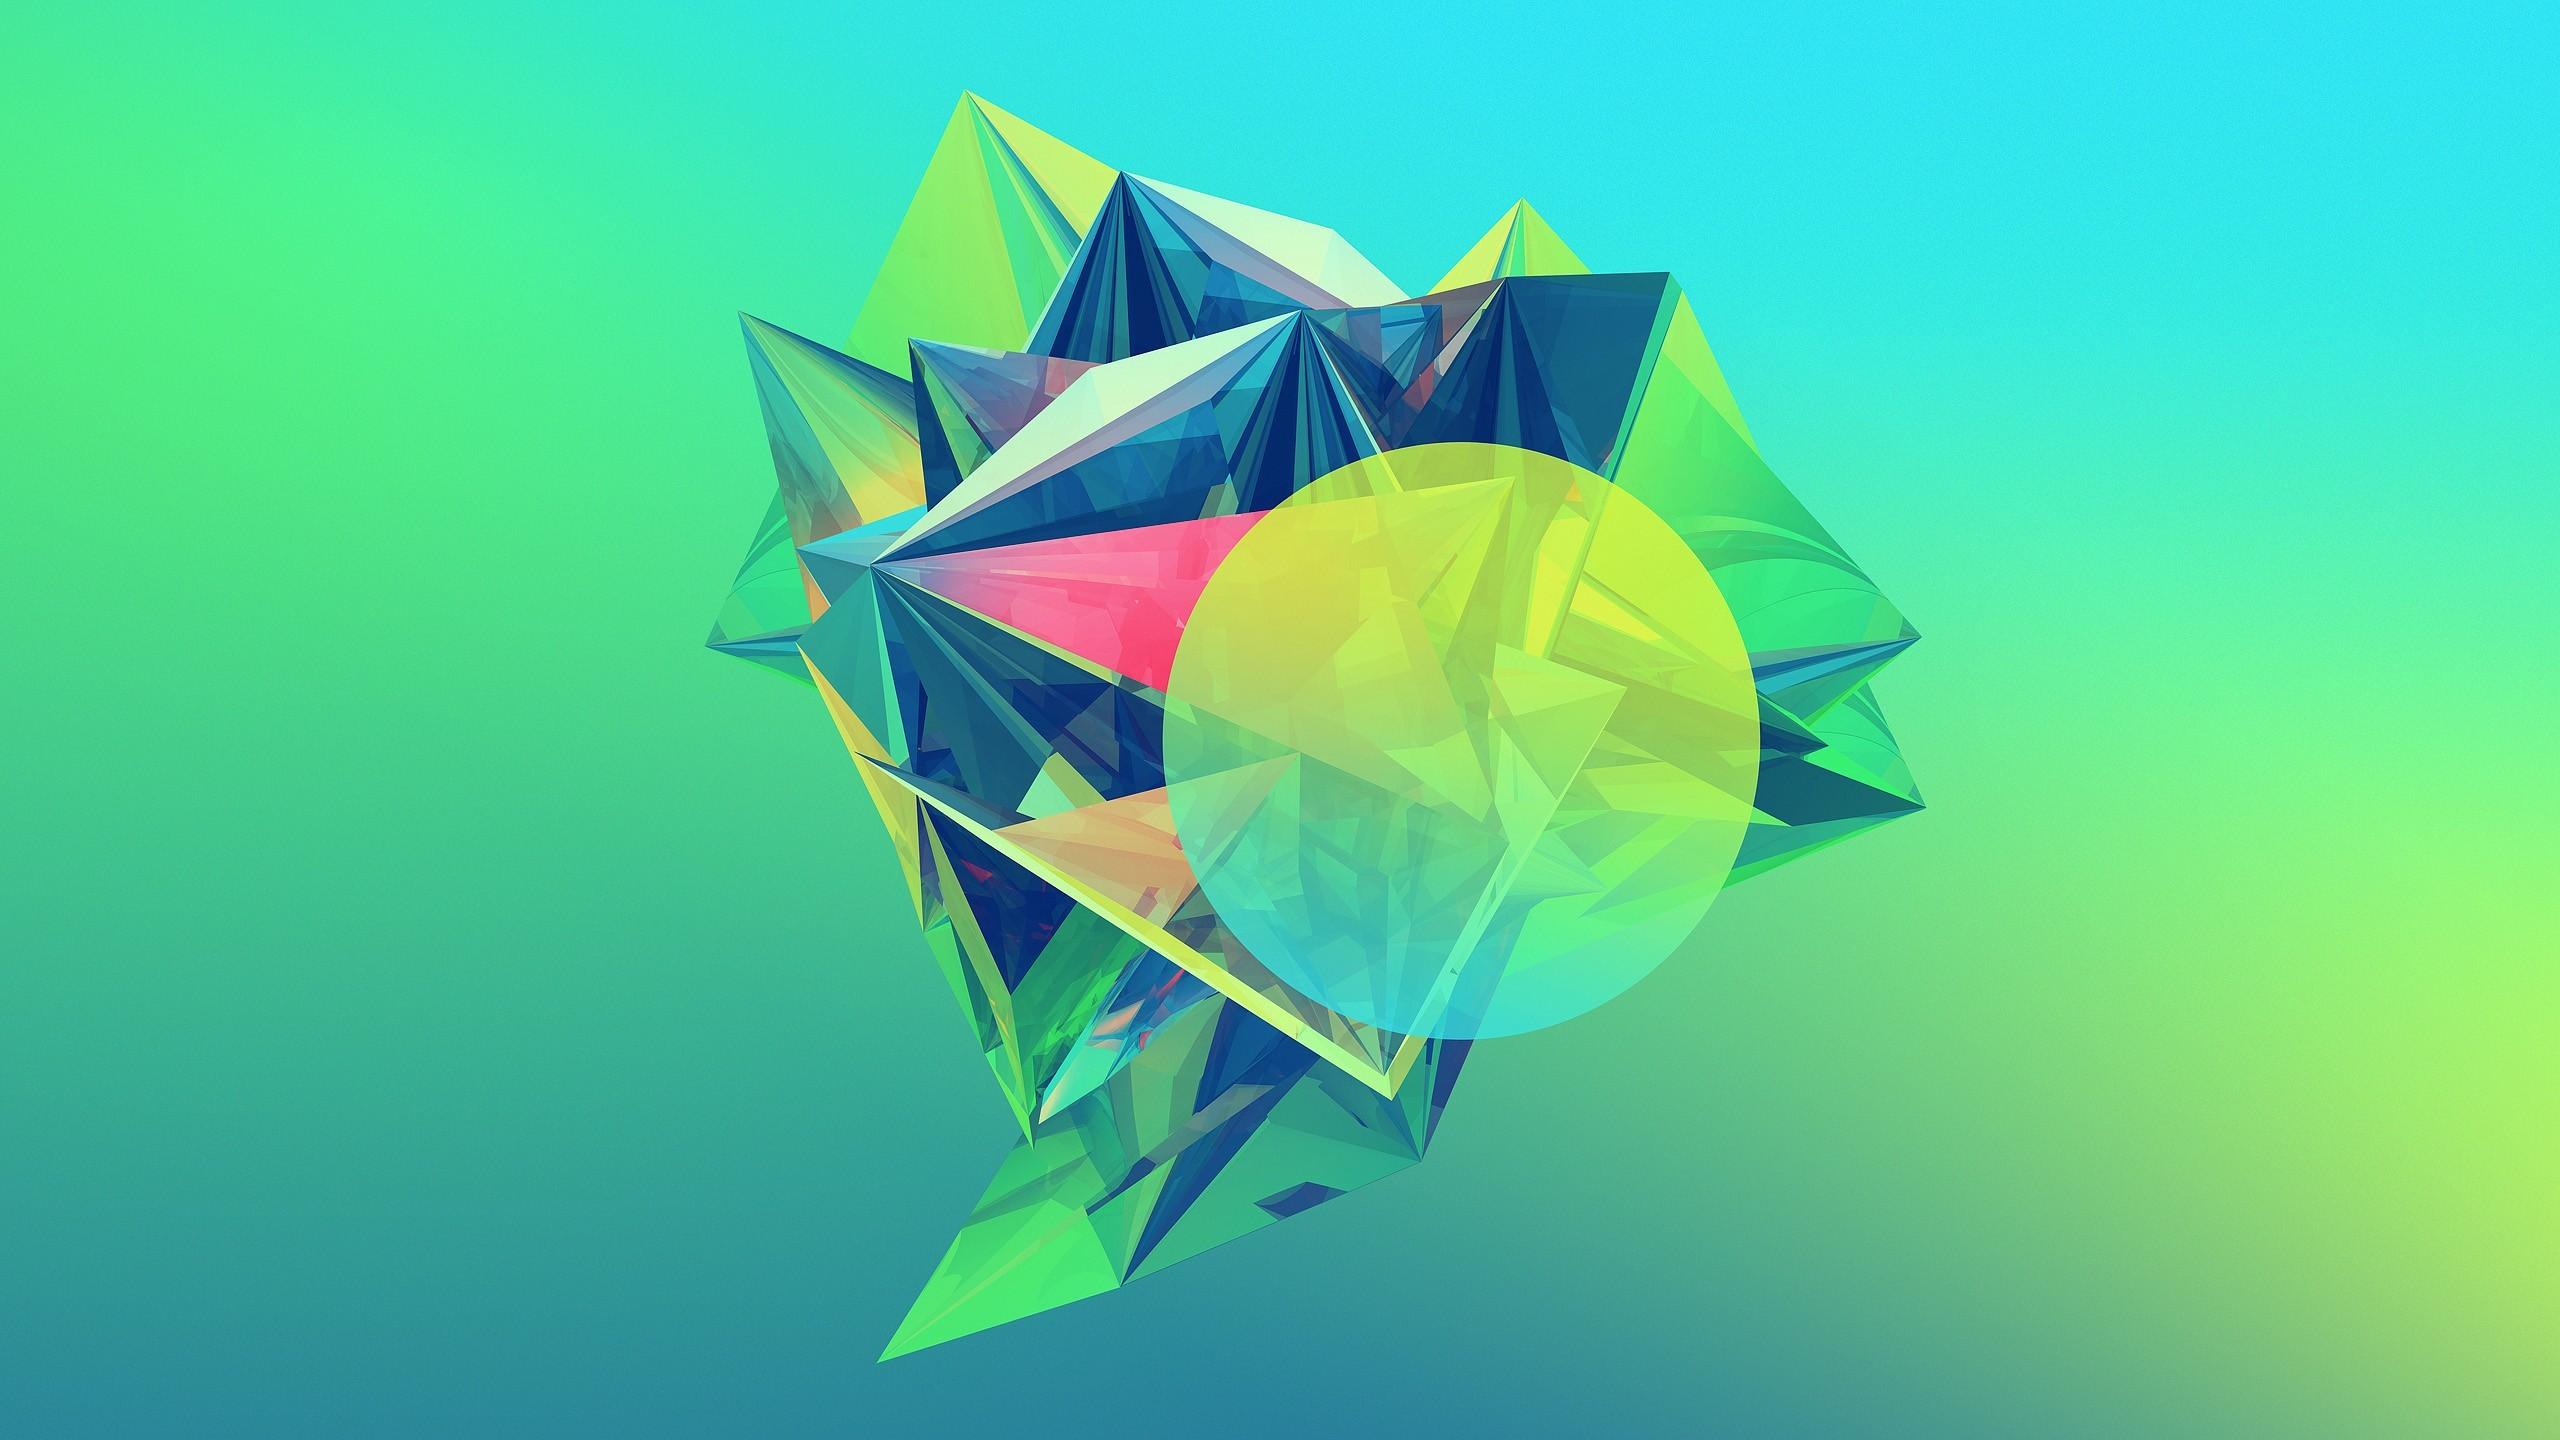 Crystalline Geometry HD Wallpaper | Download HD Wallpapers